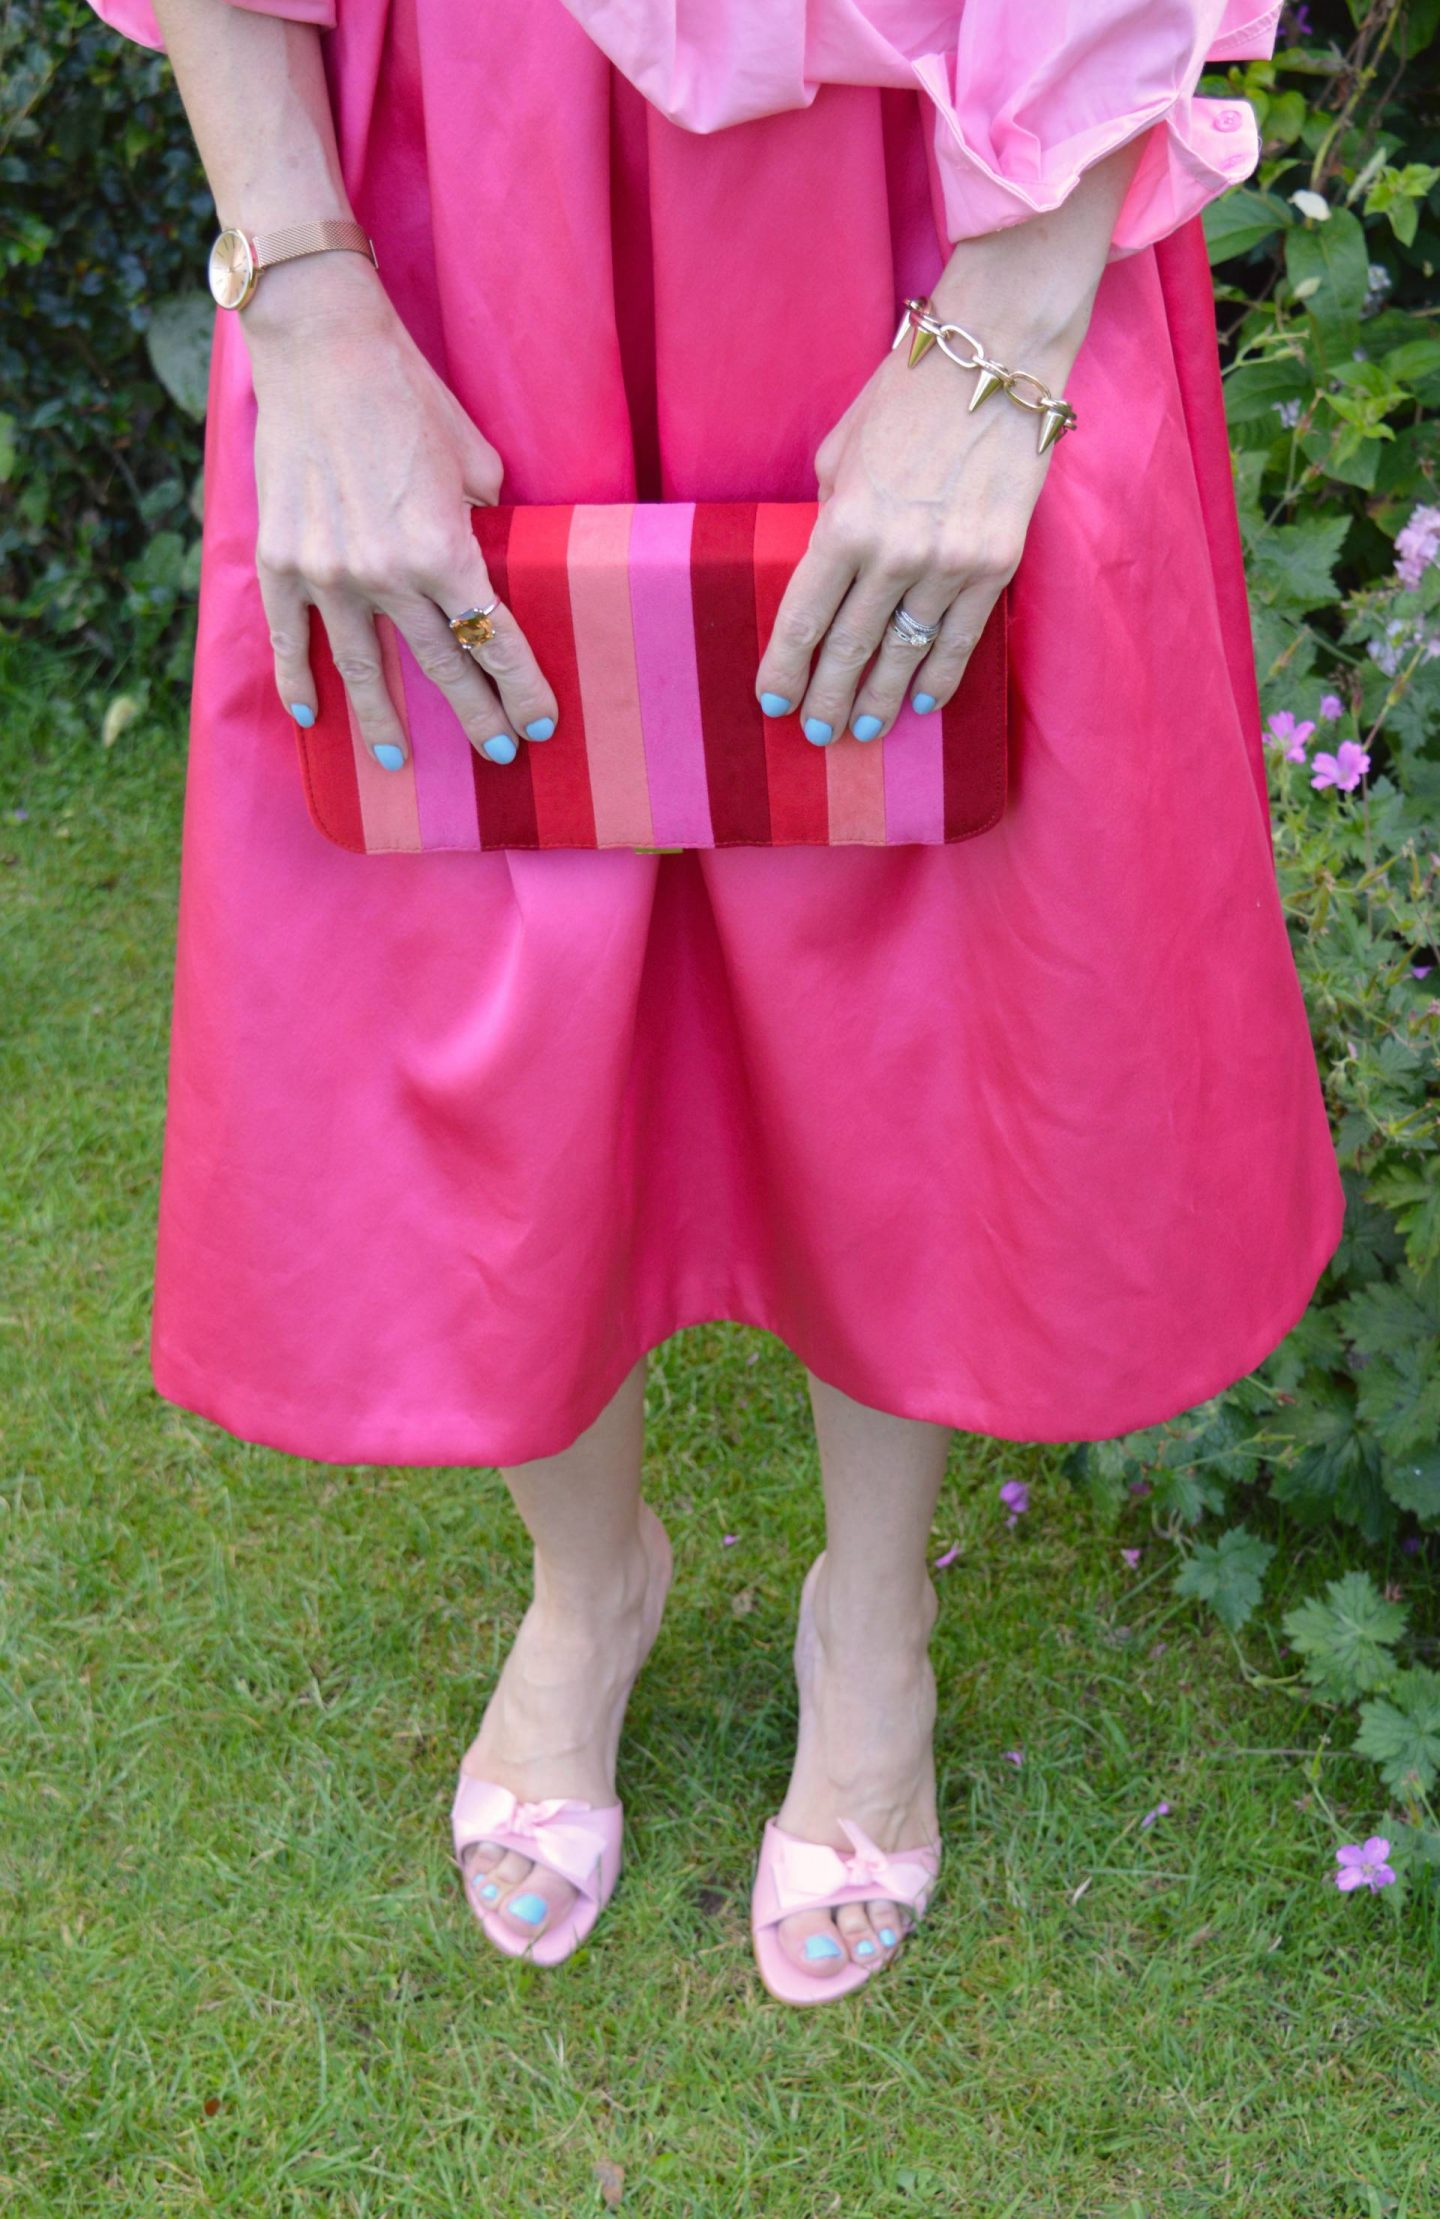 Lotus suedette striped clutch, River Island pink satin skirt